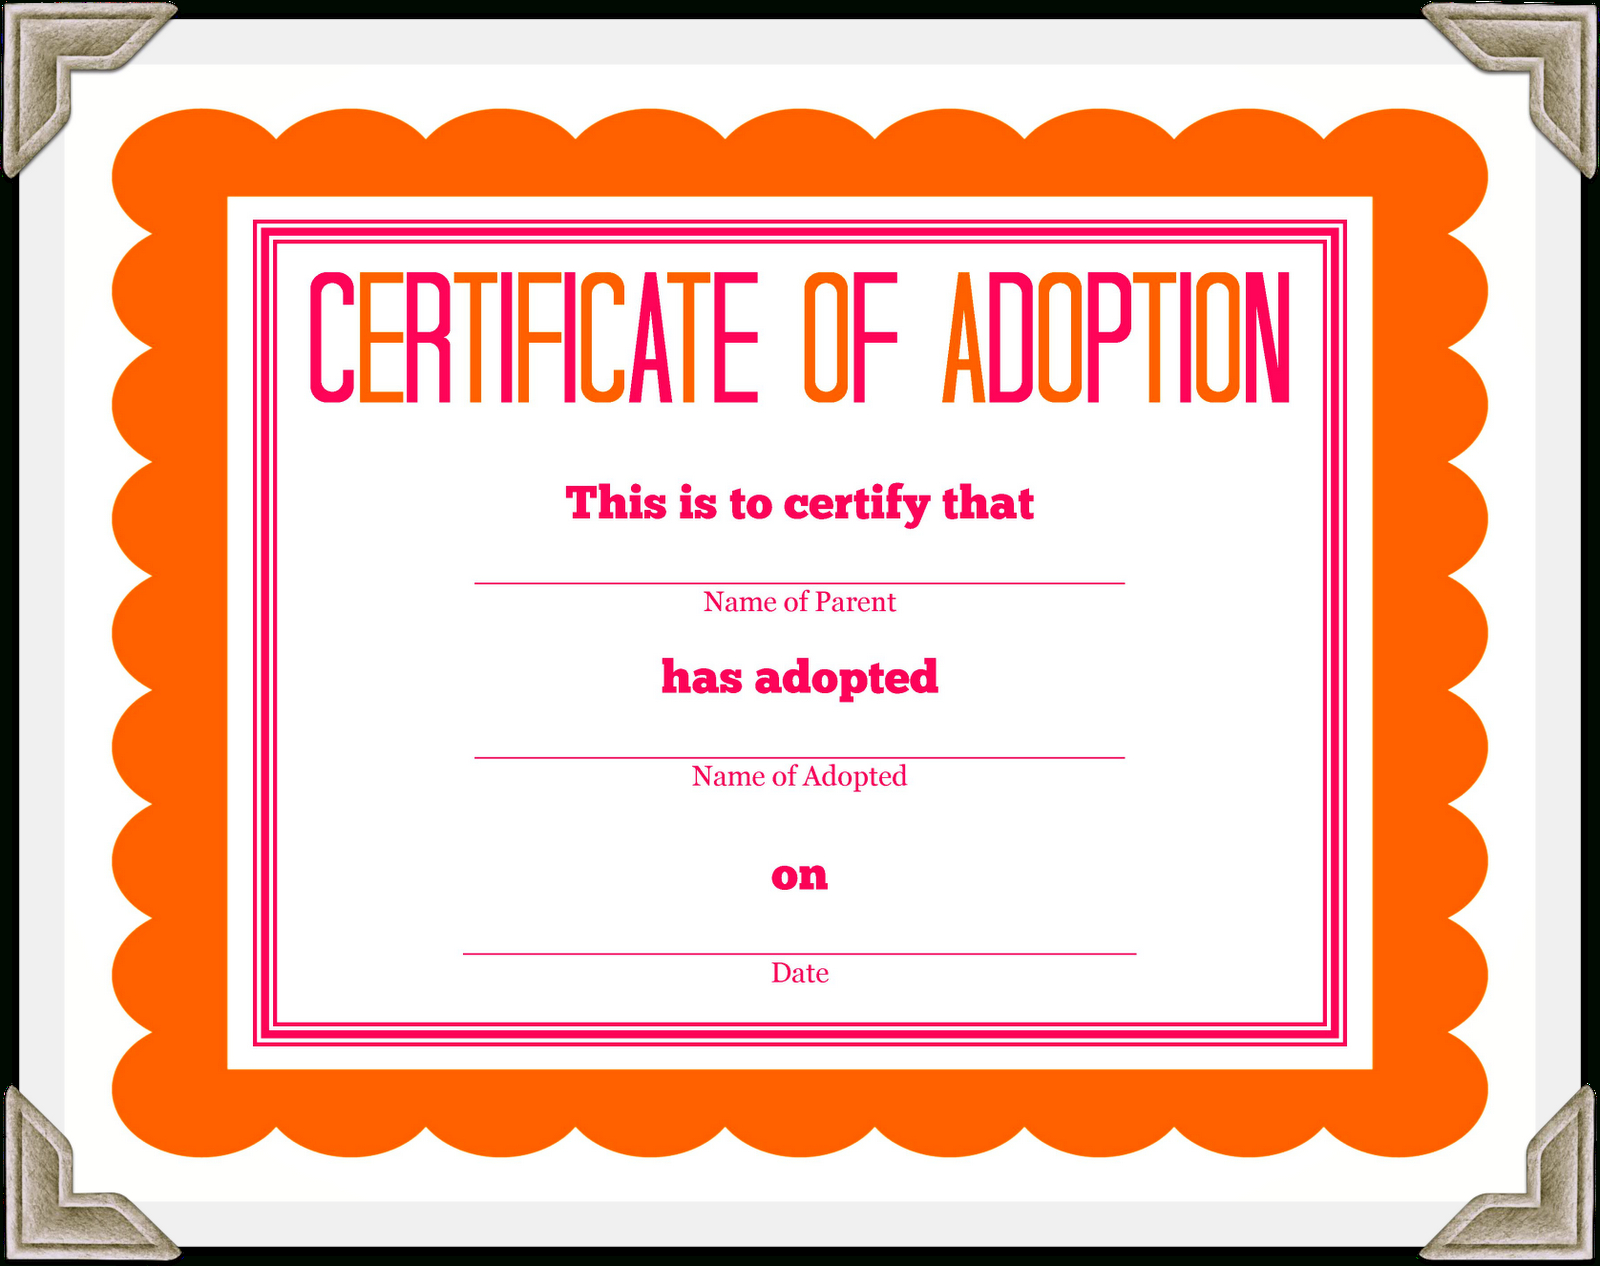 Stuffed Animal Adoption Certificate - Free Printable Stuffed Animal Adoption Certificate